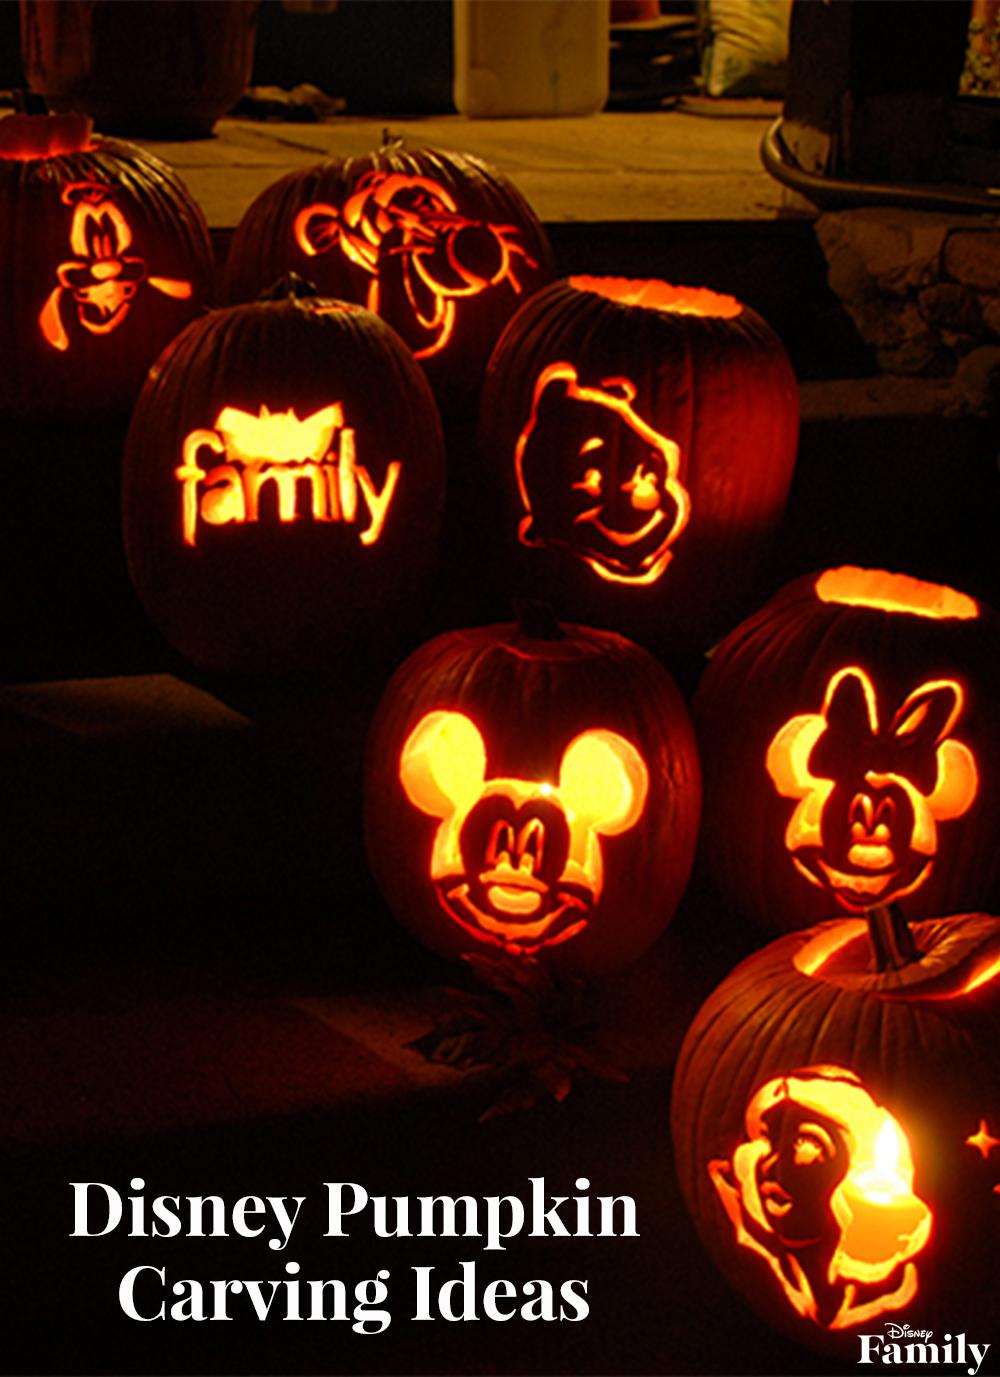 Disney Pumpkin Carving Ideas | Disney Family - Free Pumpkin Carving Patterns Disney Printable